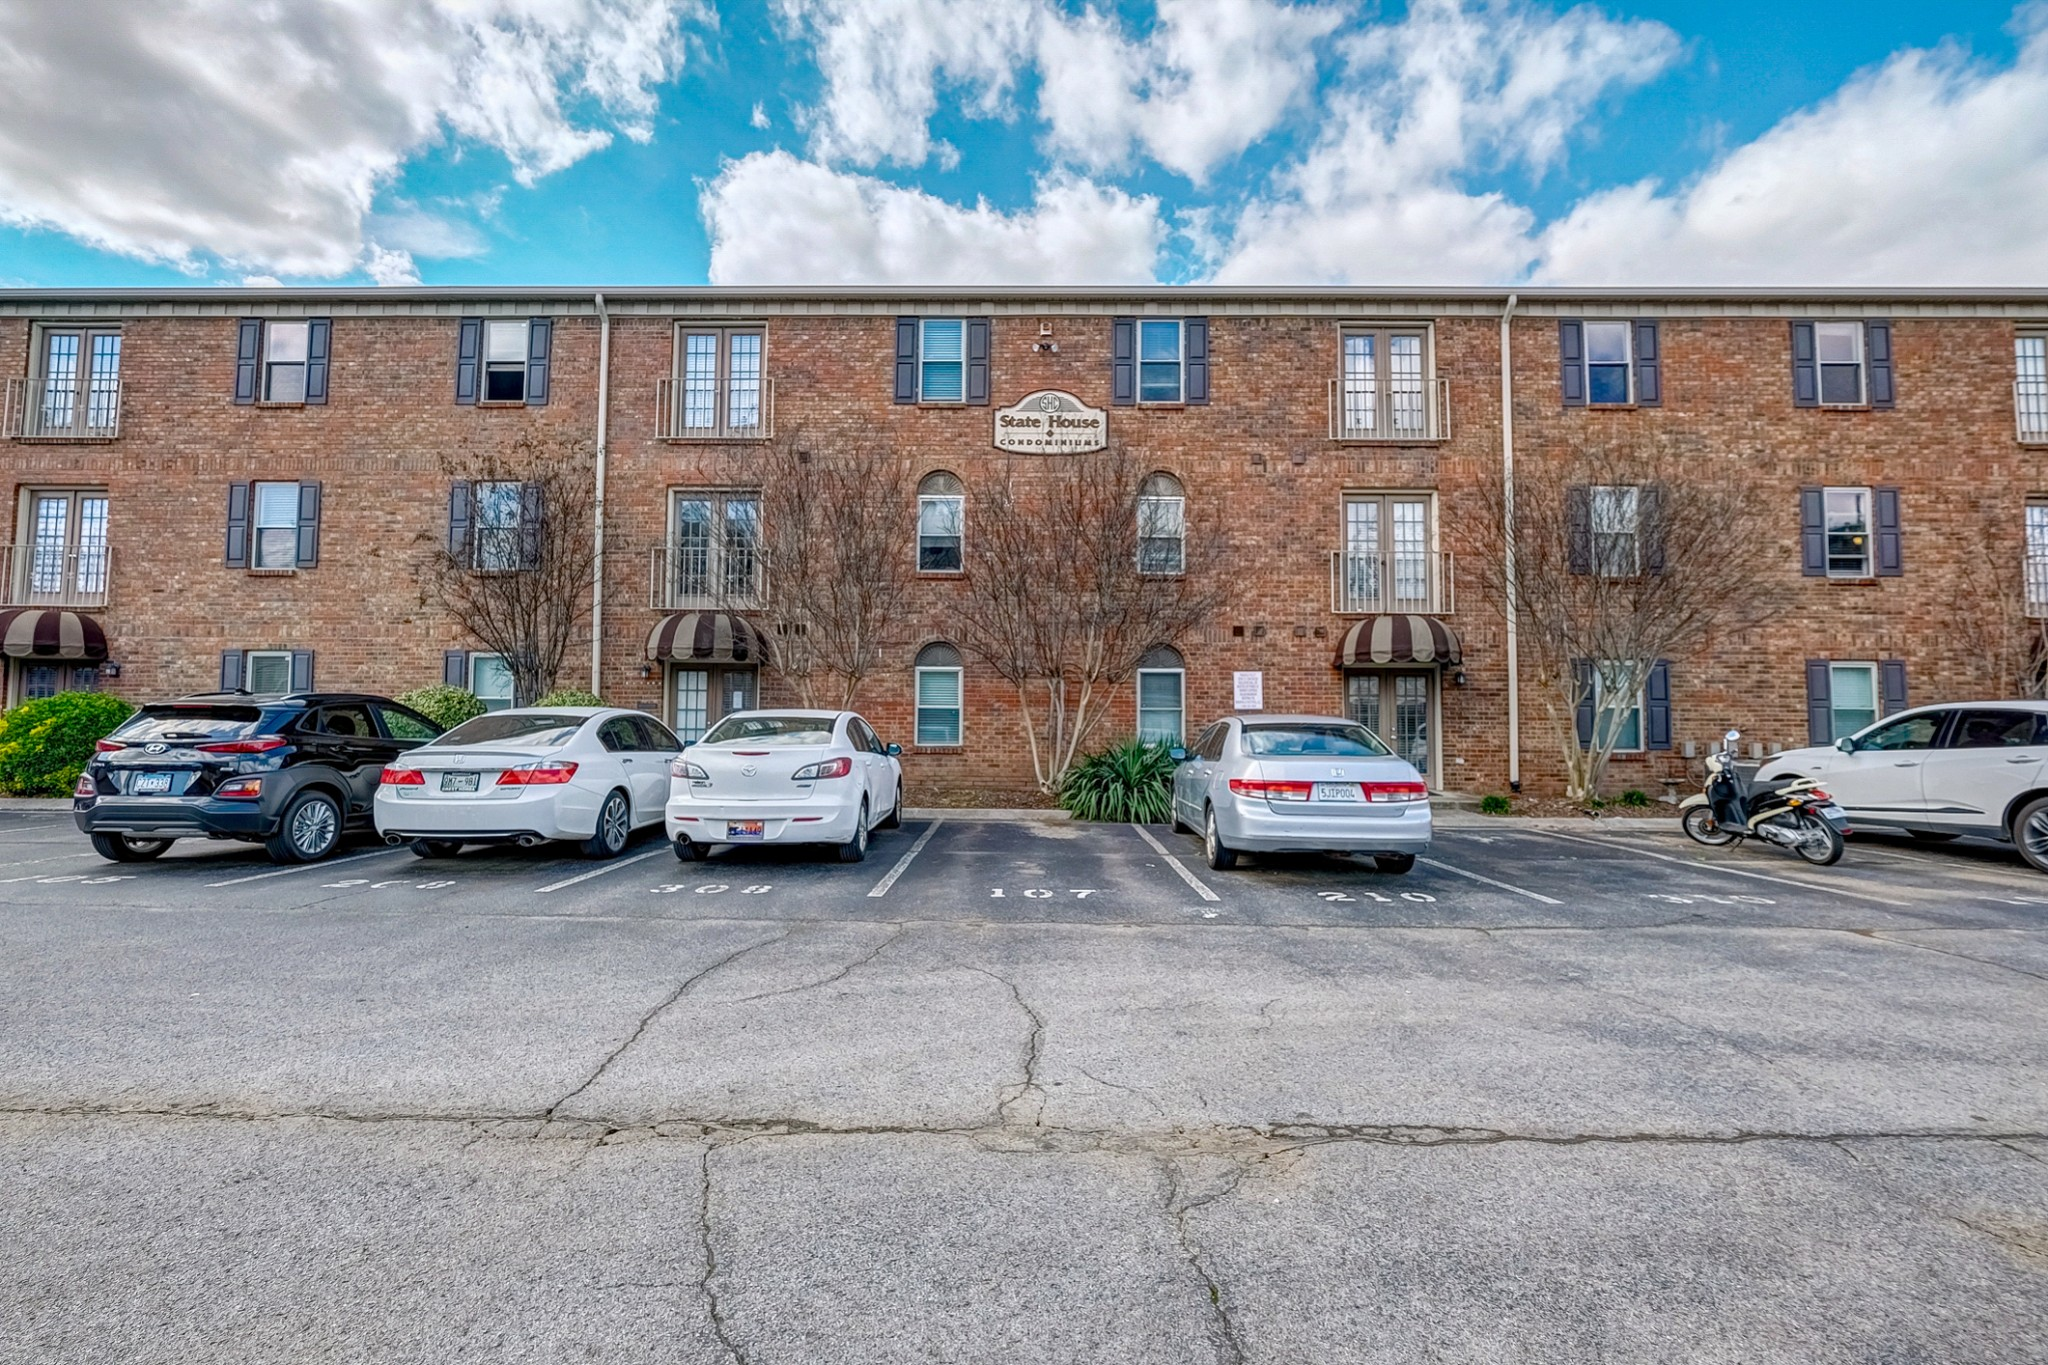 1808 State St, Nashville - Midtown, Tennessee